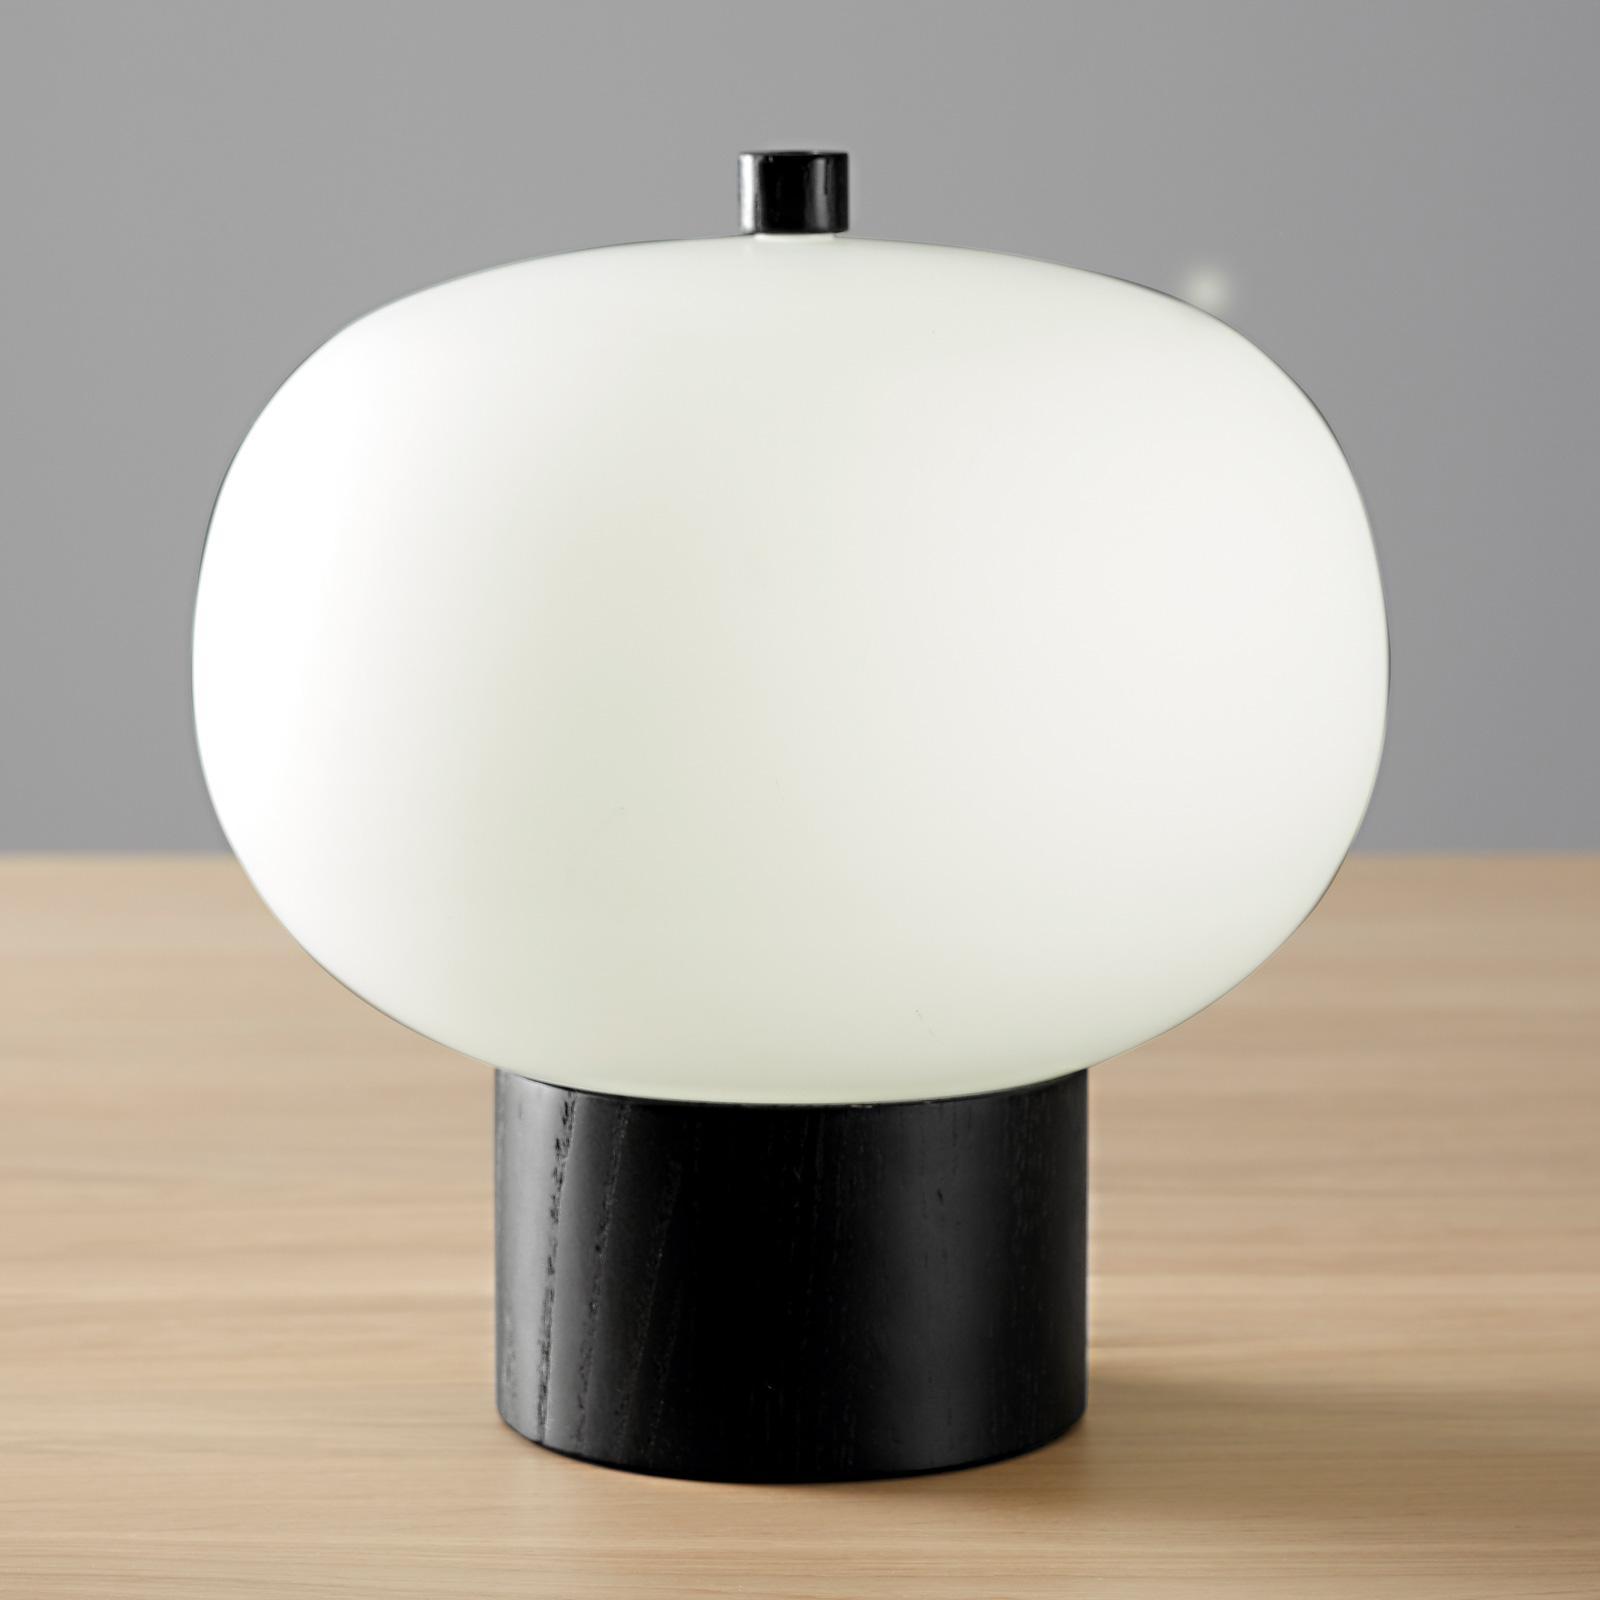 Grok iLargi LED-Tischlampe, Ø 24 cm, dunkle Esche